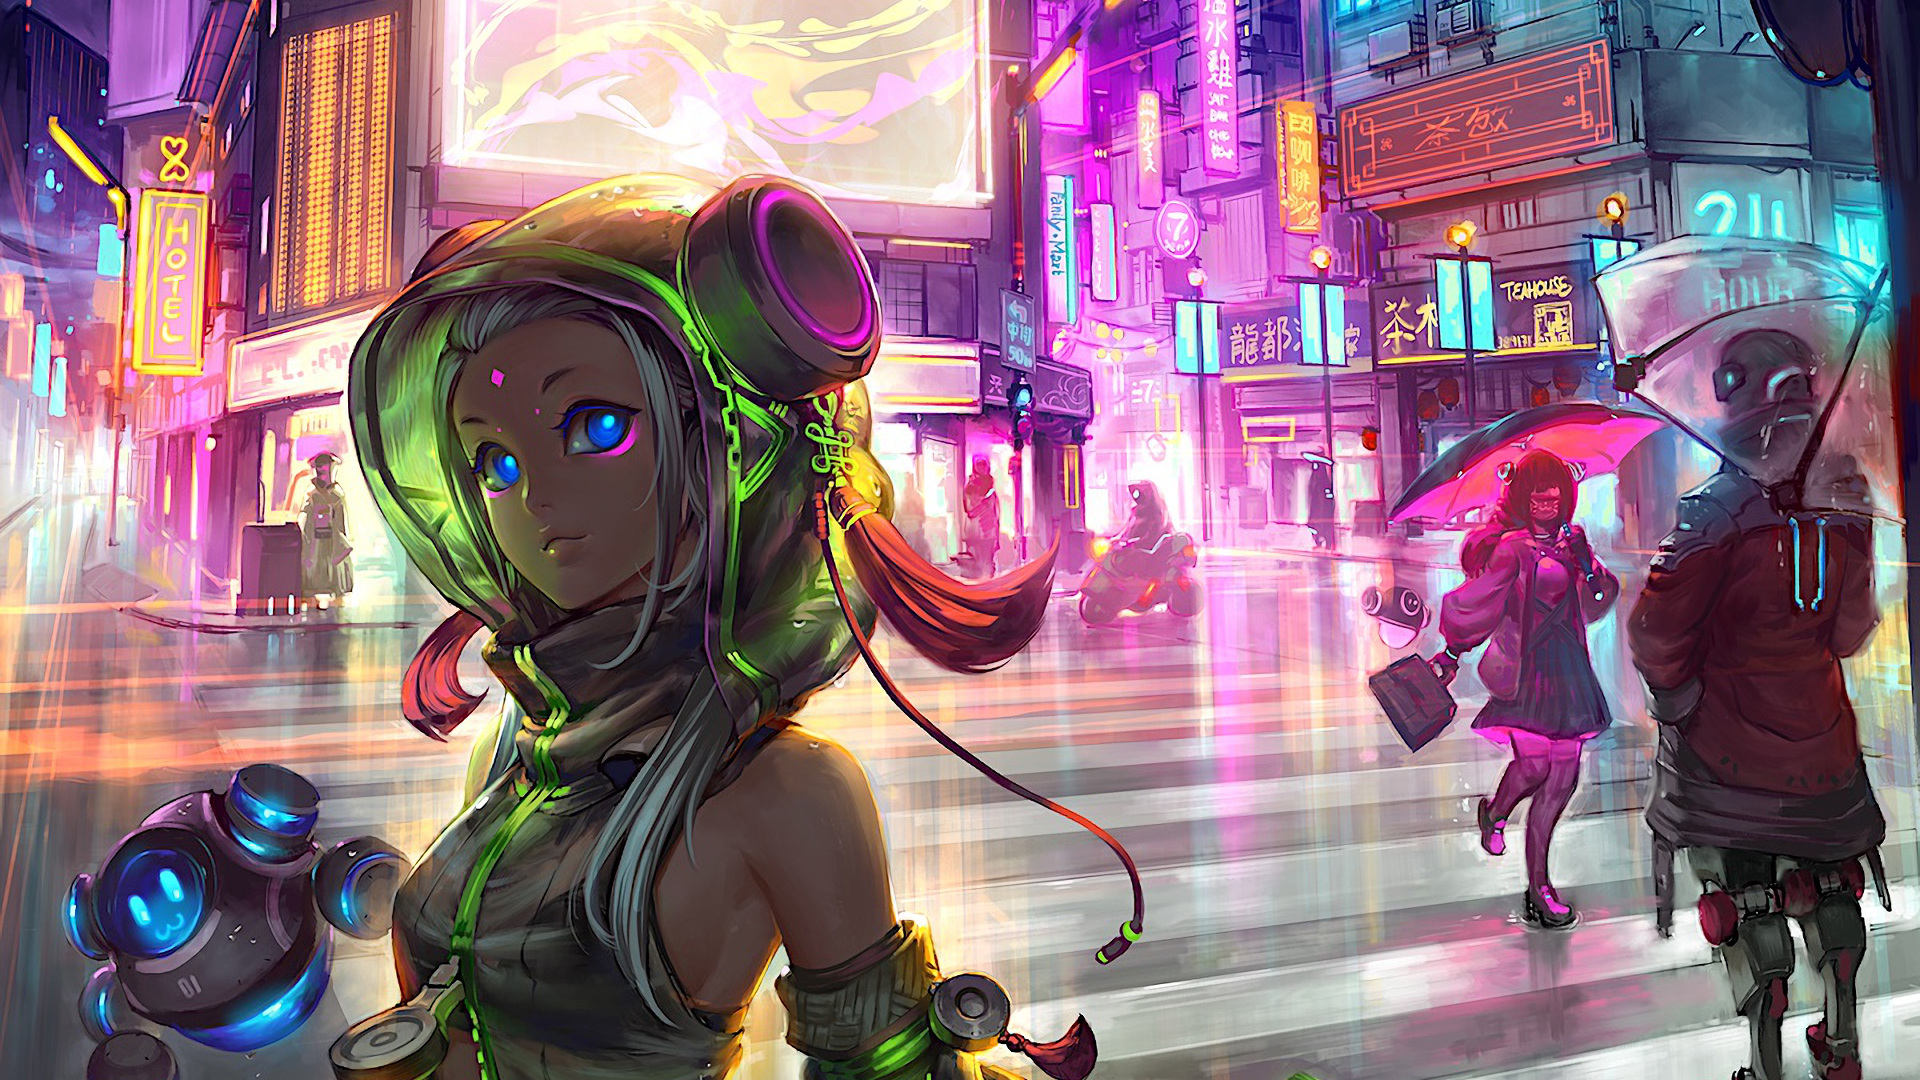 1920x1080 Anime Cyberpunk Scifi City Laptop Full HD 1080P ...